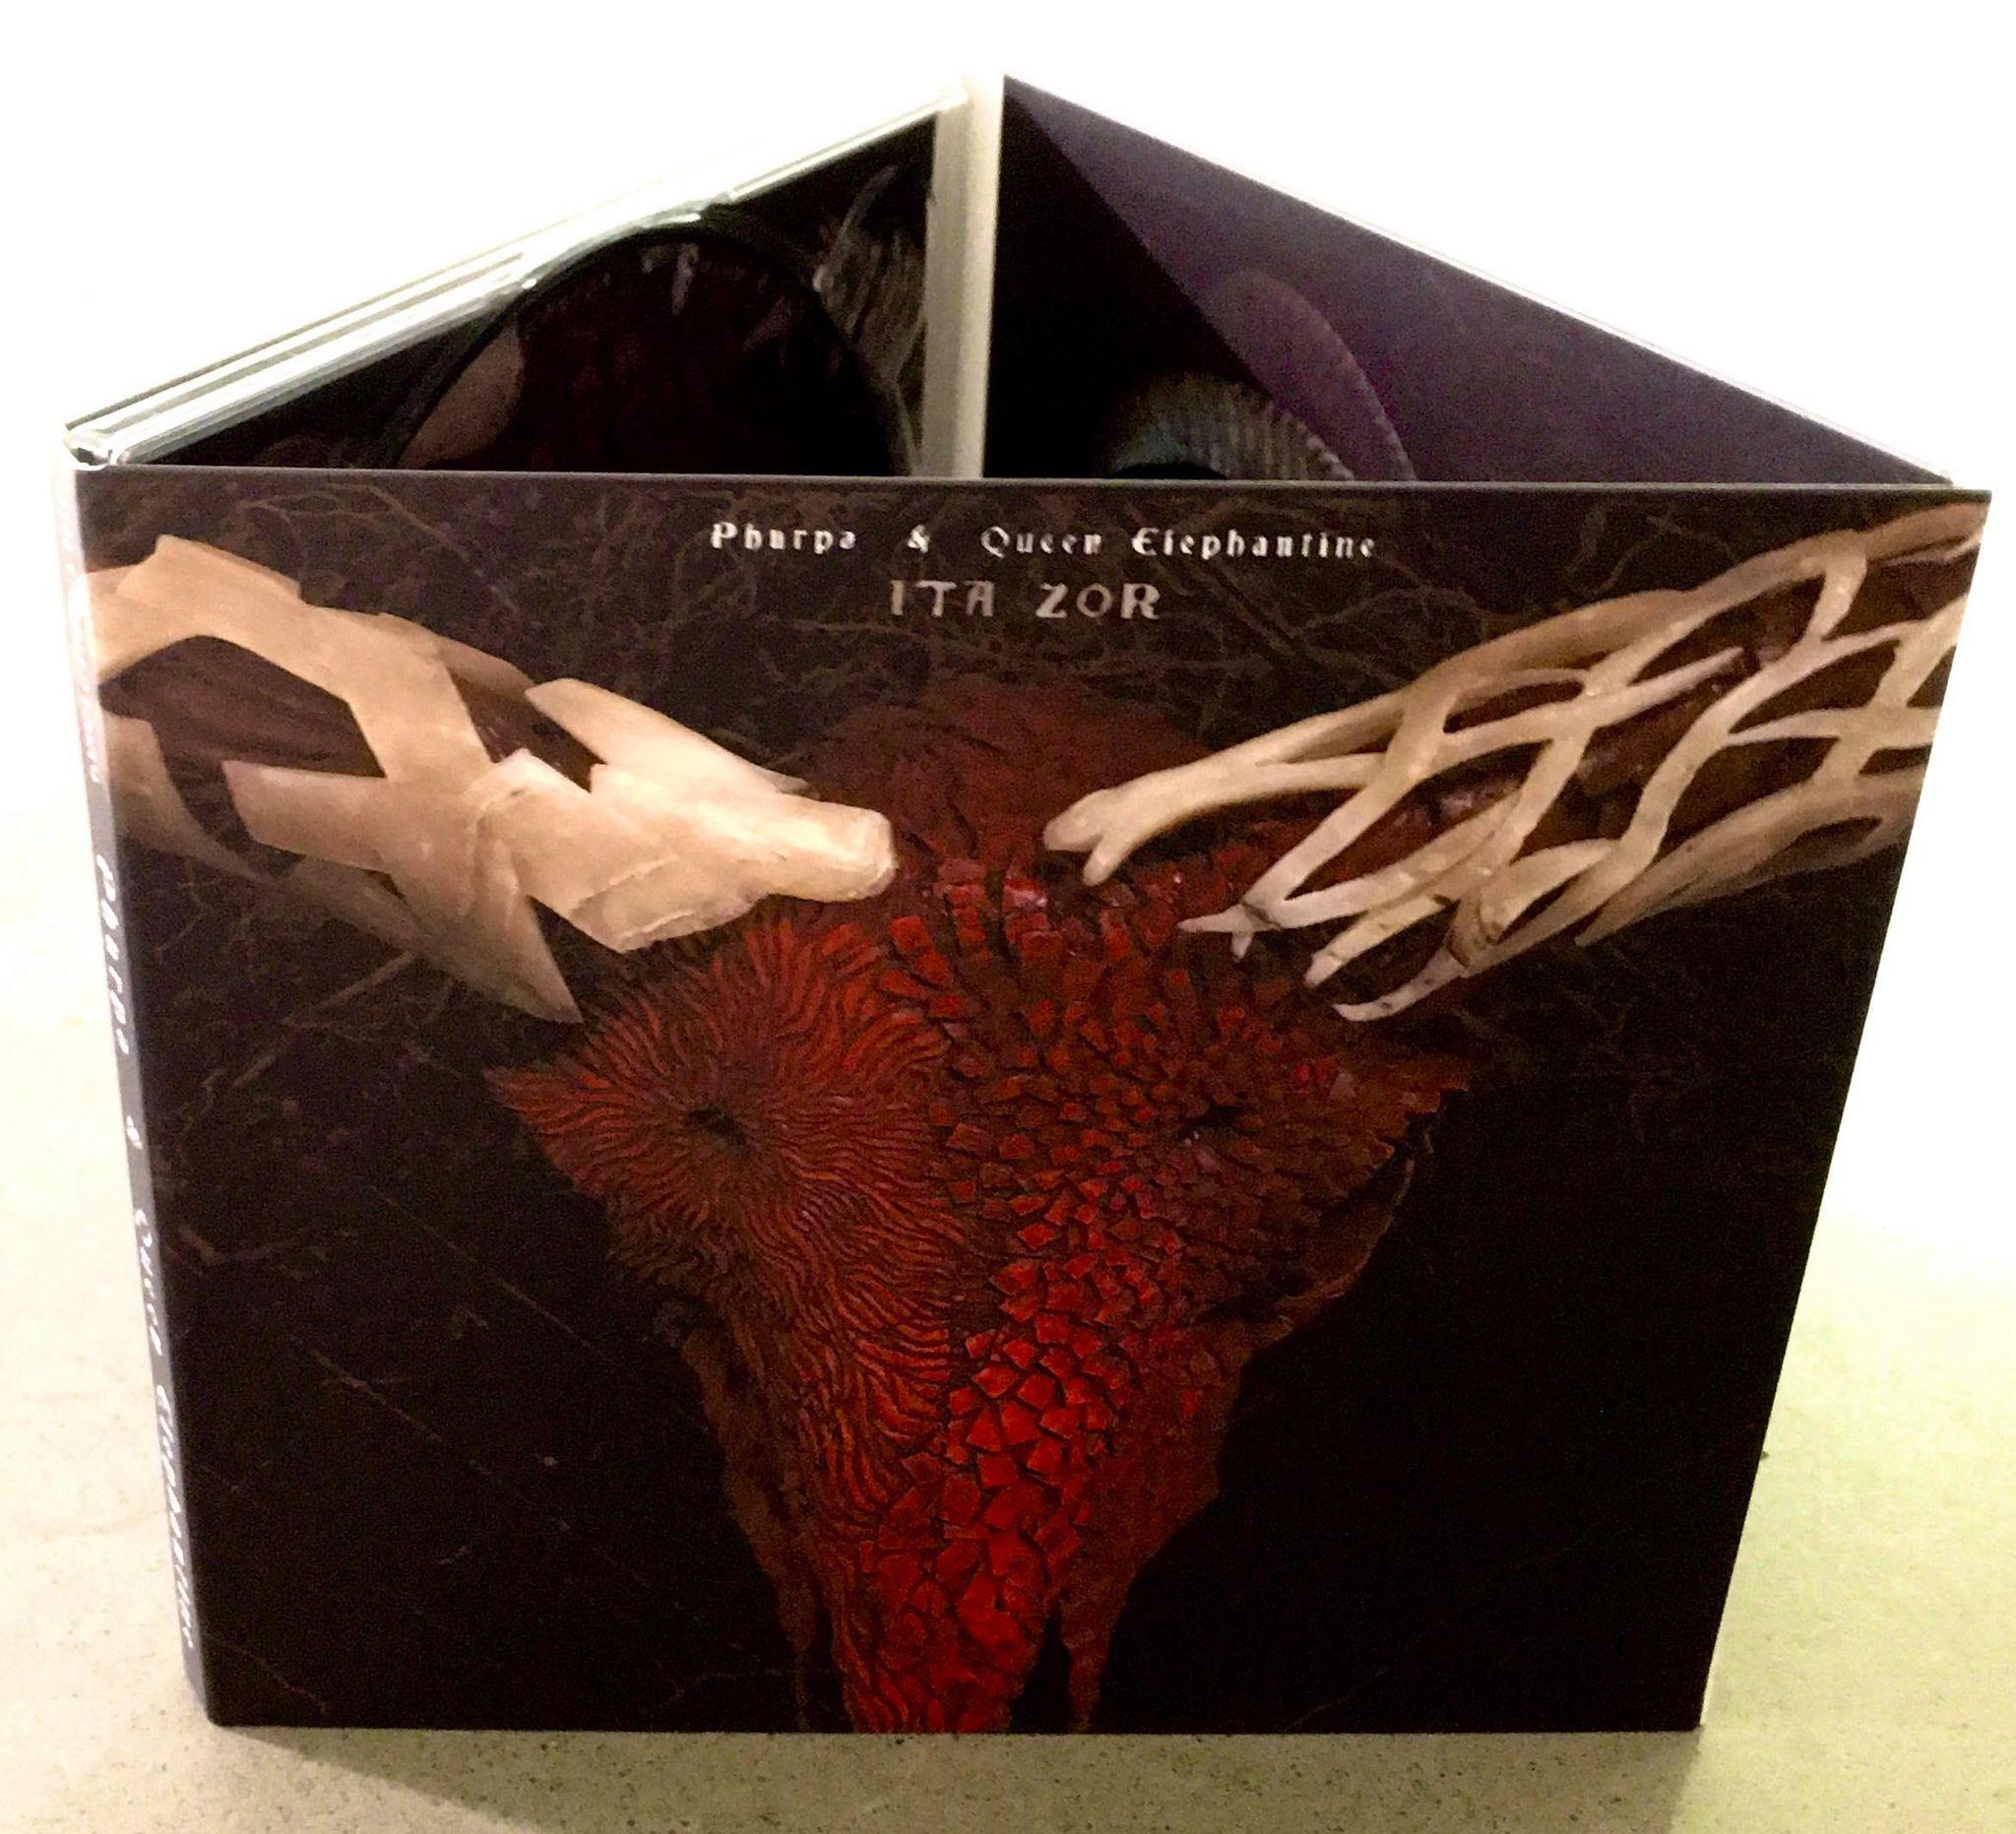 Phurpa & Queen Elephantine - Ita Zor CD (1)